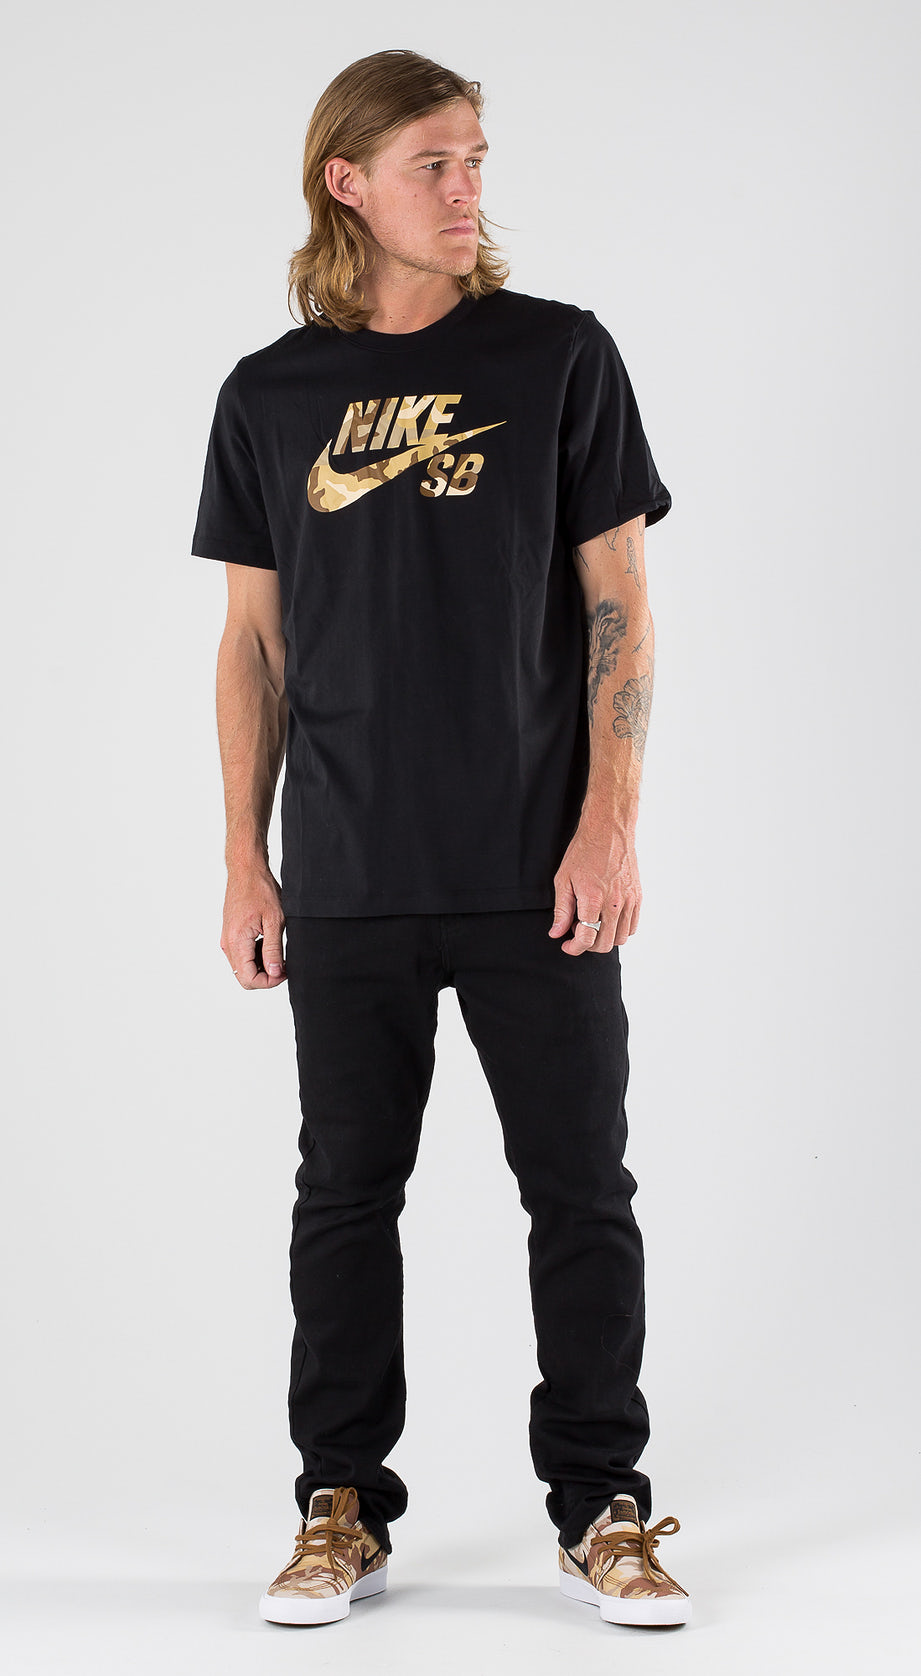 Nike SB Logo Snsl 2 Black Outfit Multi